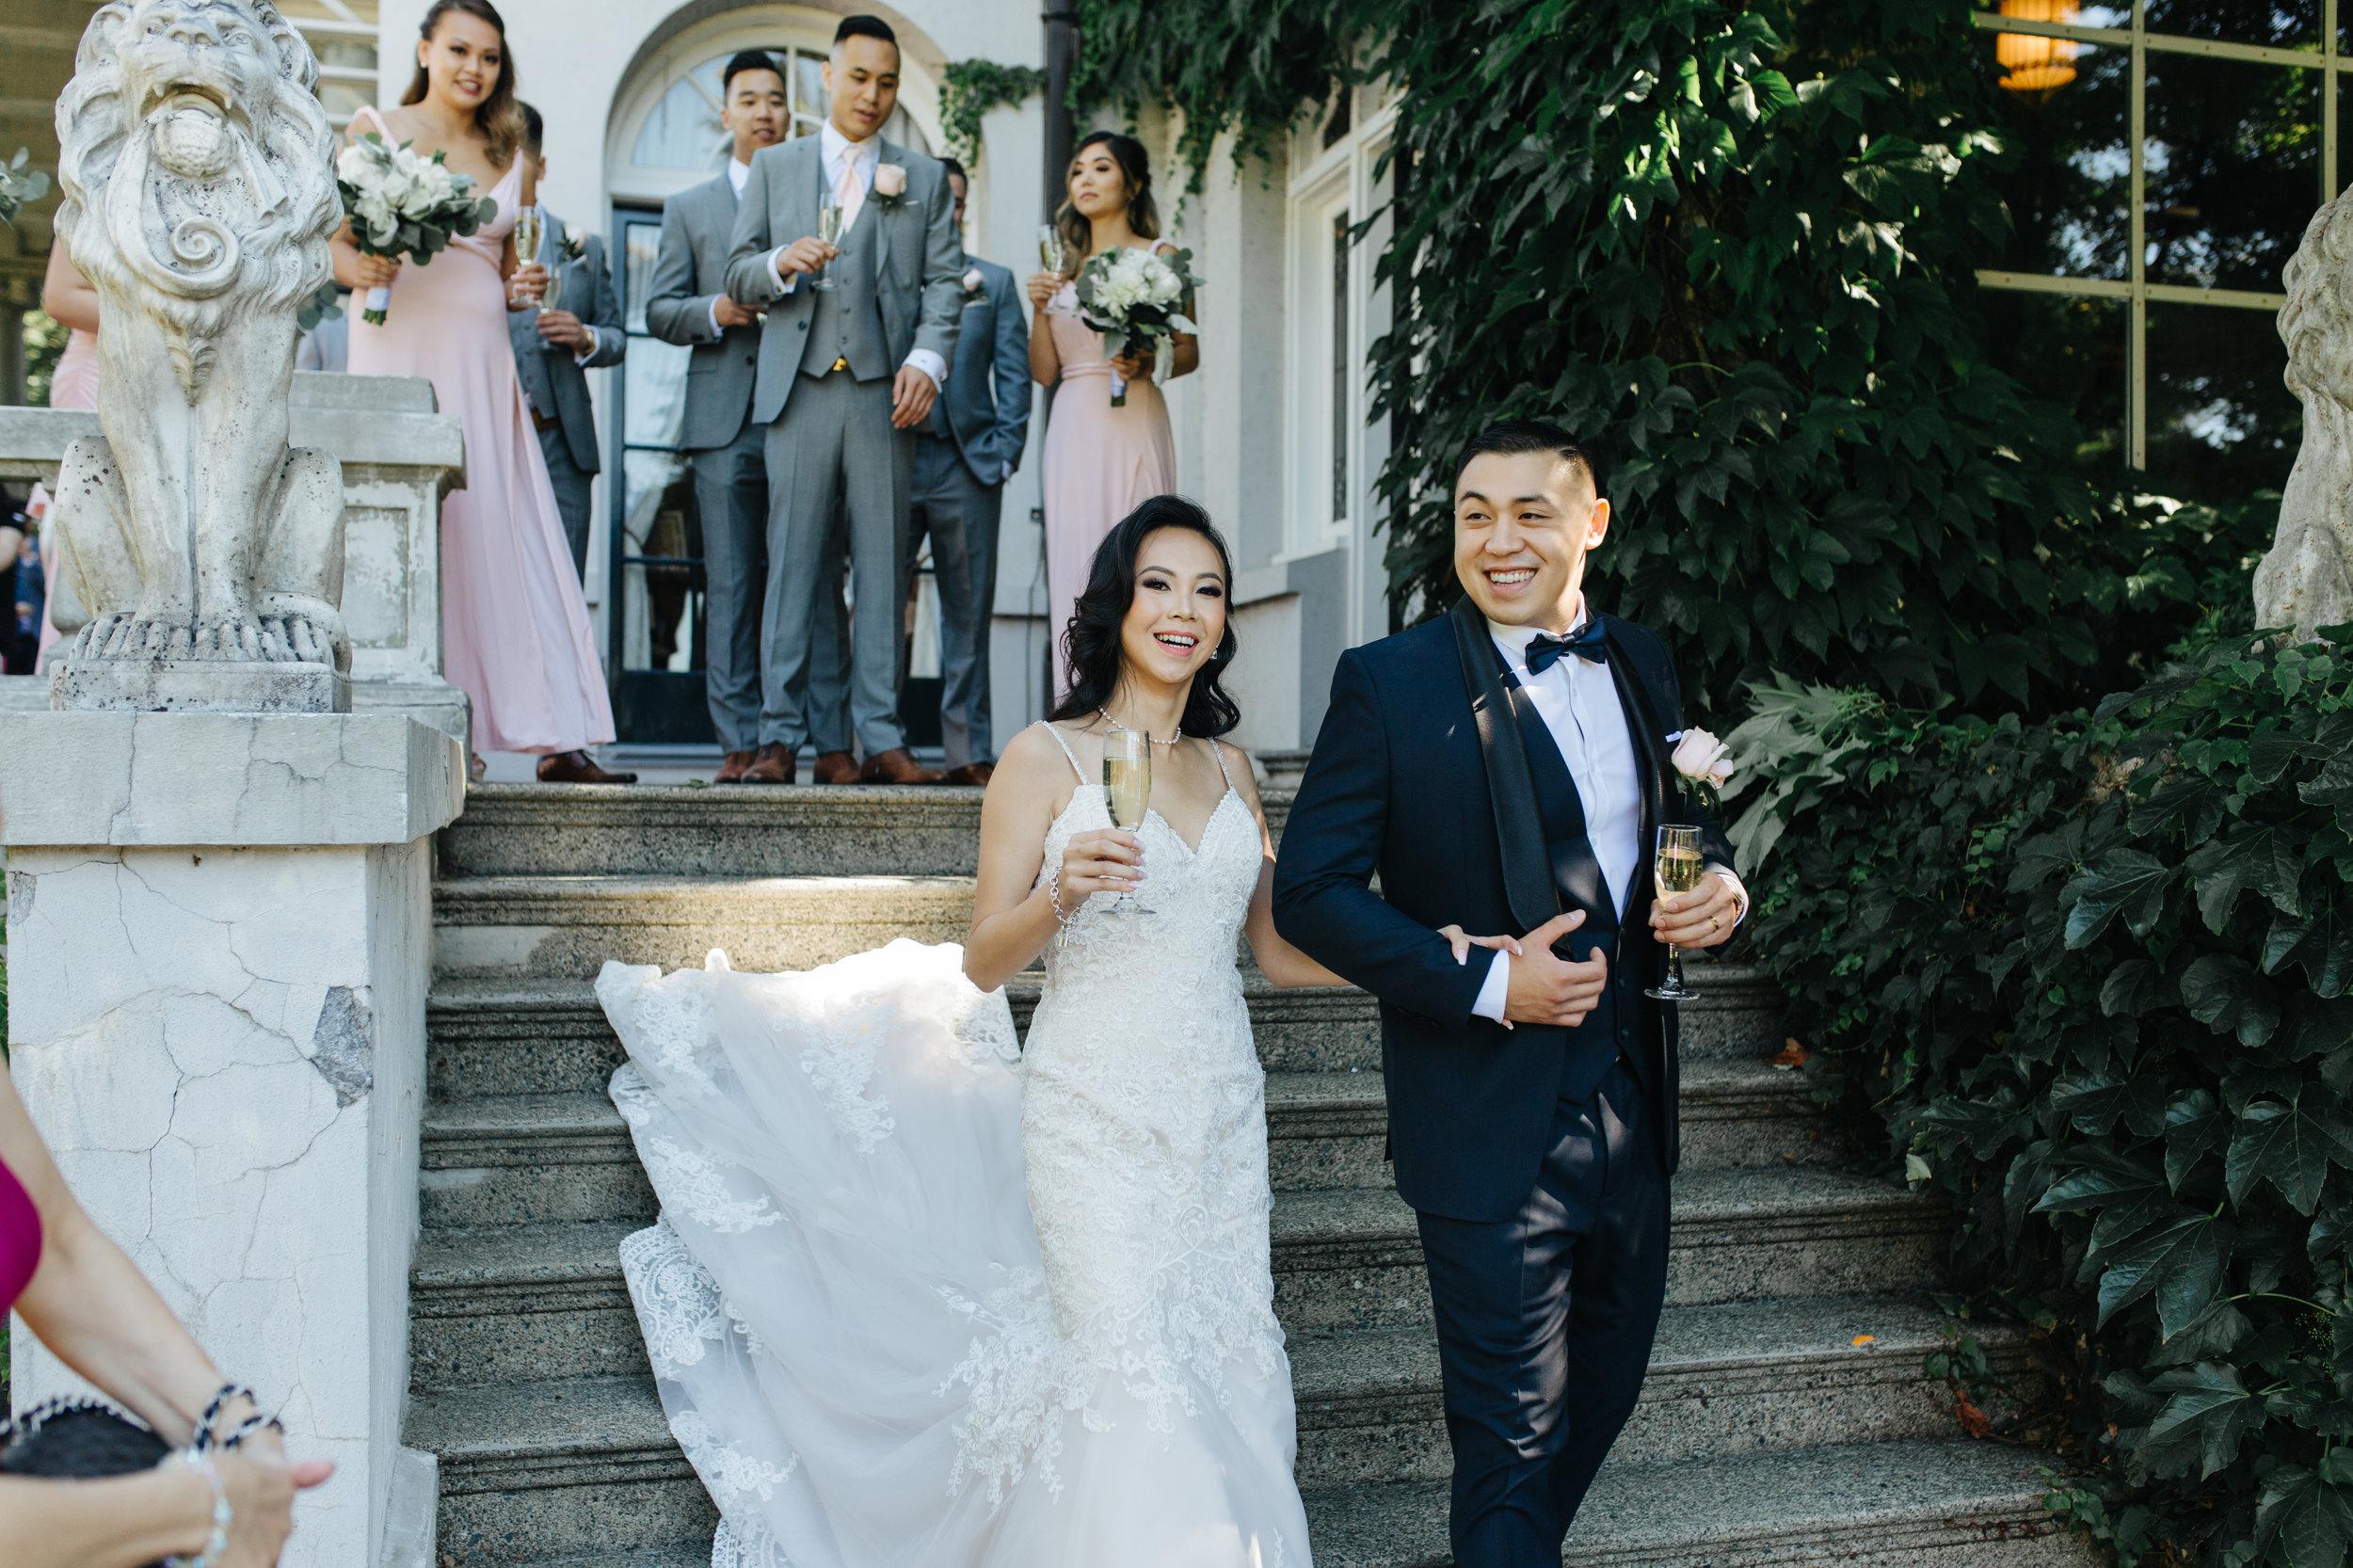 herastudios_wedding_ashley_david_collectors_package-260.jpg